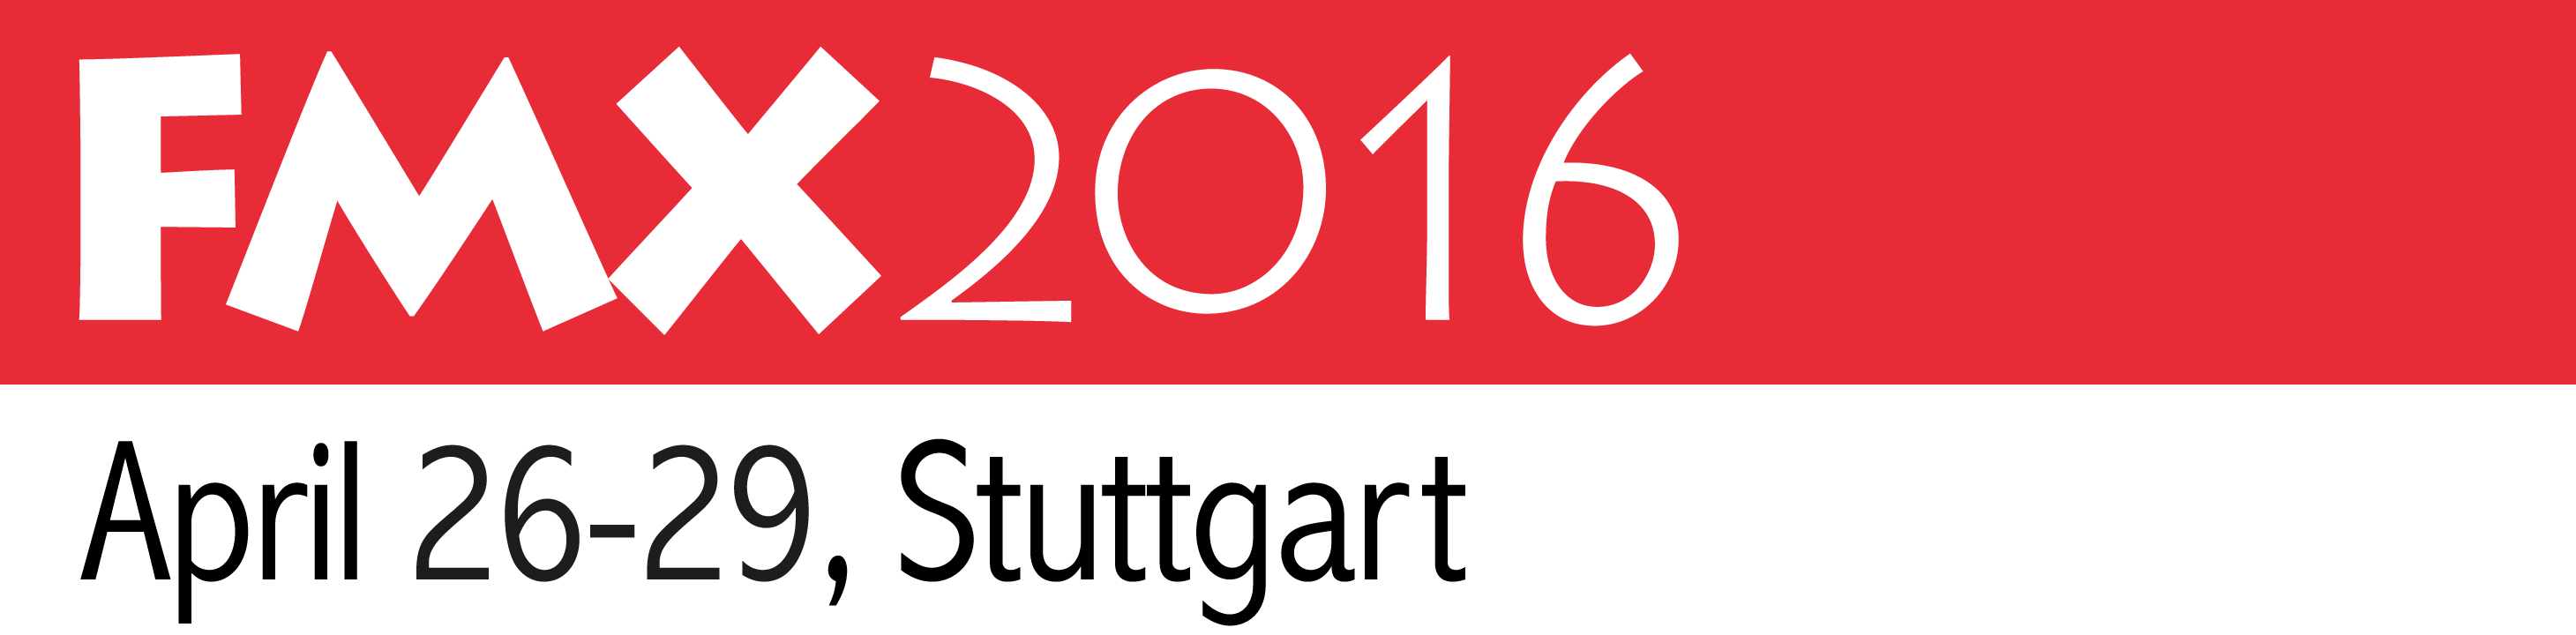 FMX-2016_ONLINE_Date-Location_black-type